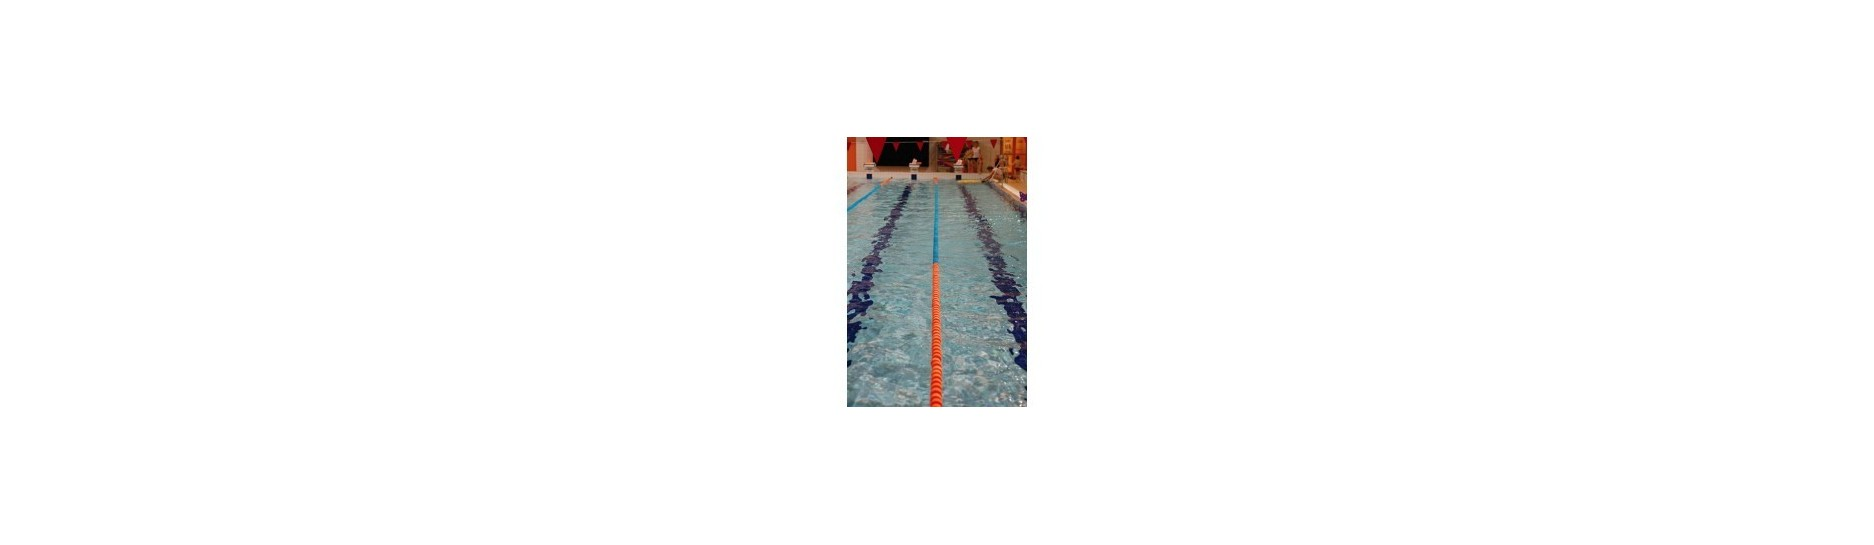 Plavecké dráhy